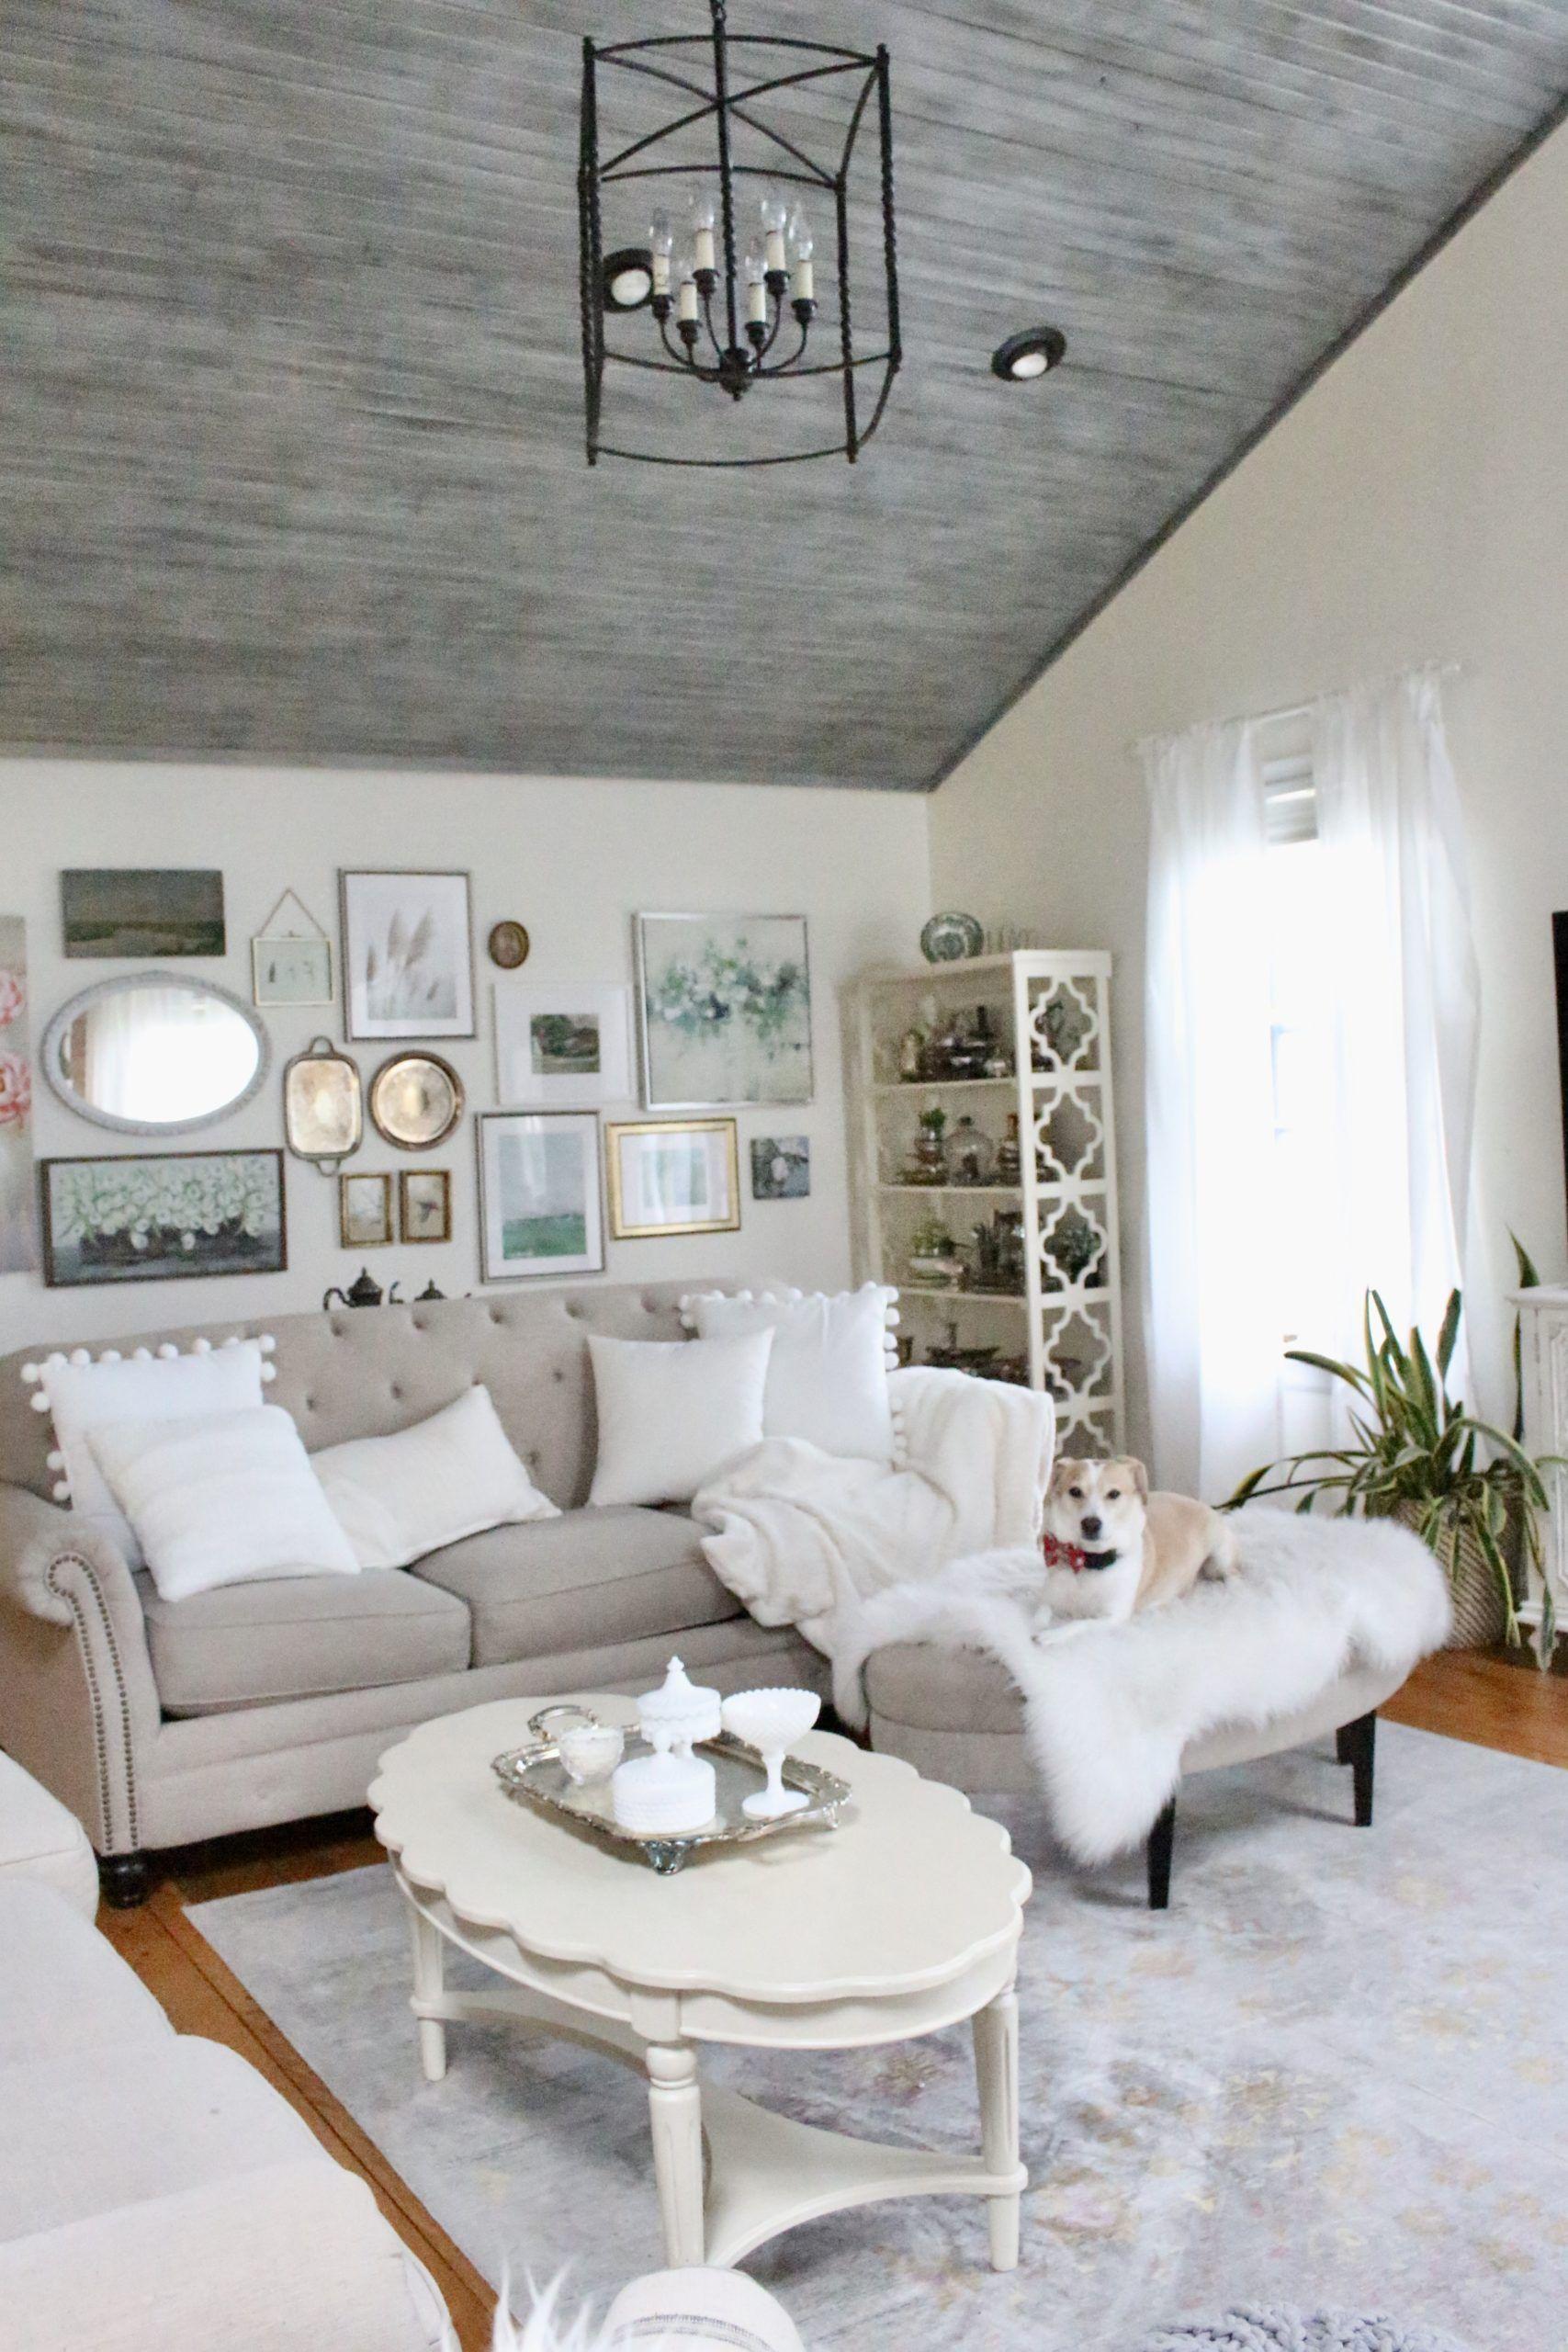 Winter Family Room Decor White Cottage Home Living In 2020 Family Room Decorating Cheap Home Decor Interior Design Kitchen Small #winter #living #room #decor